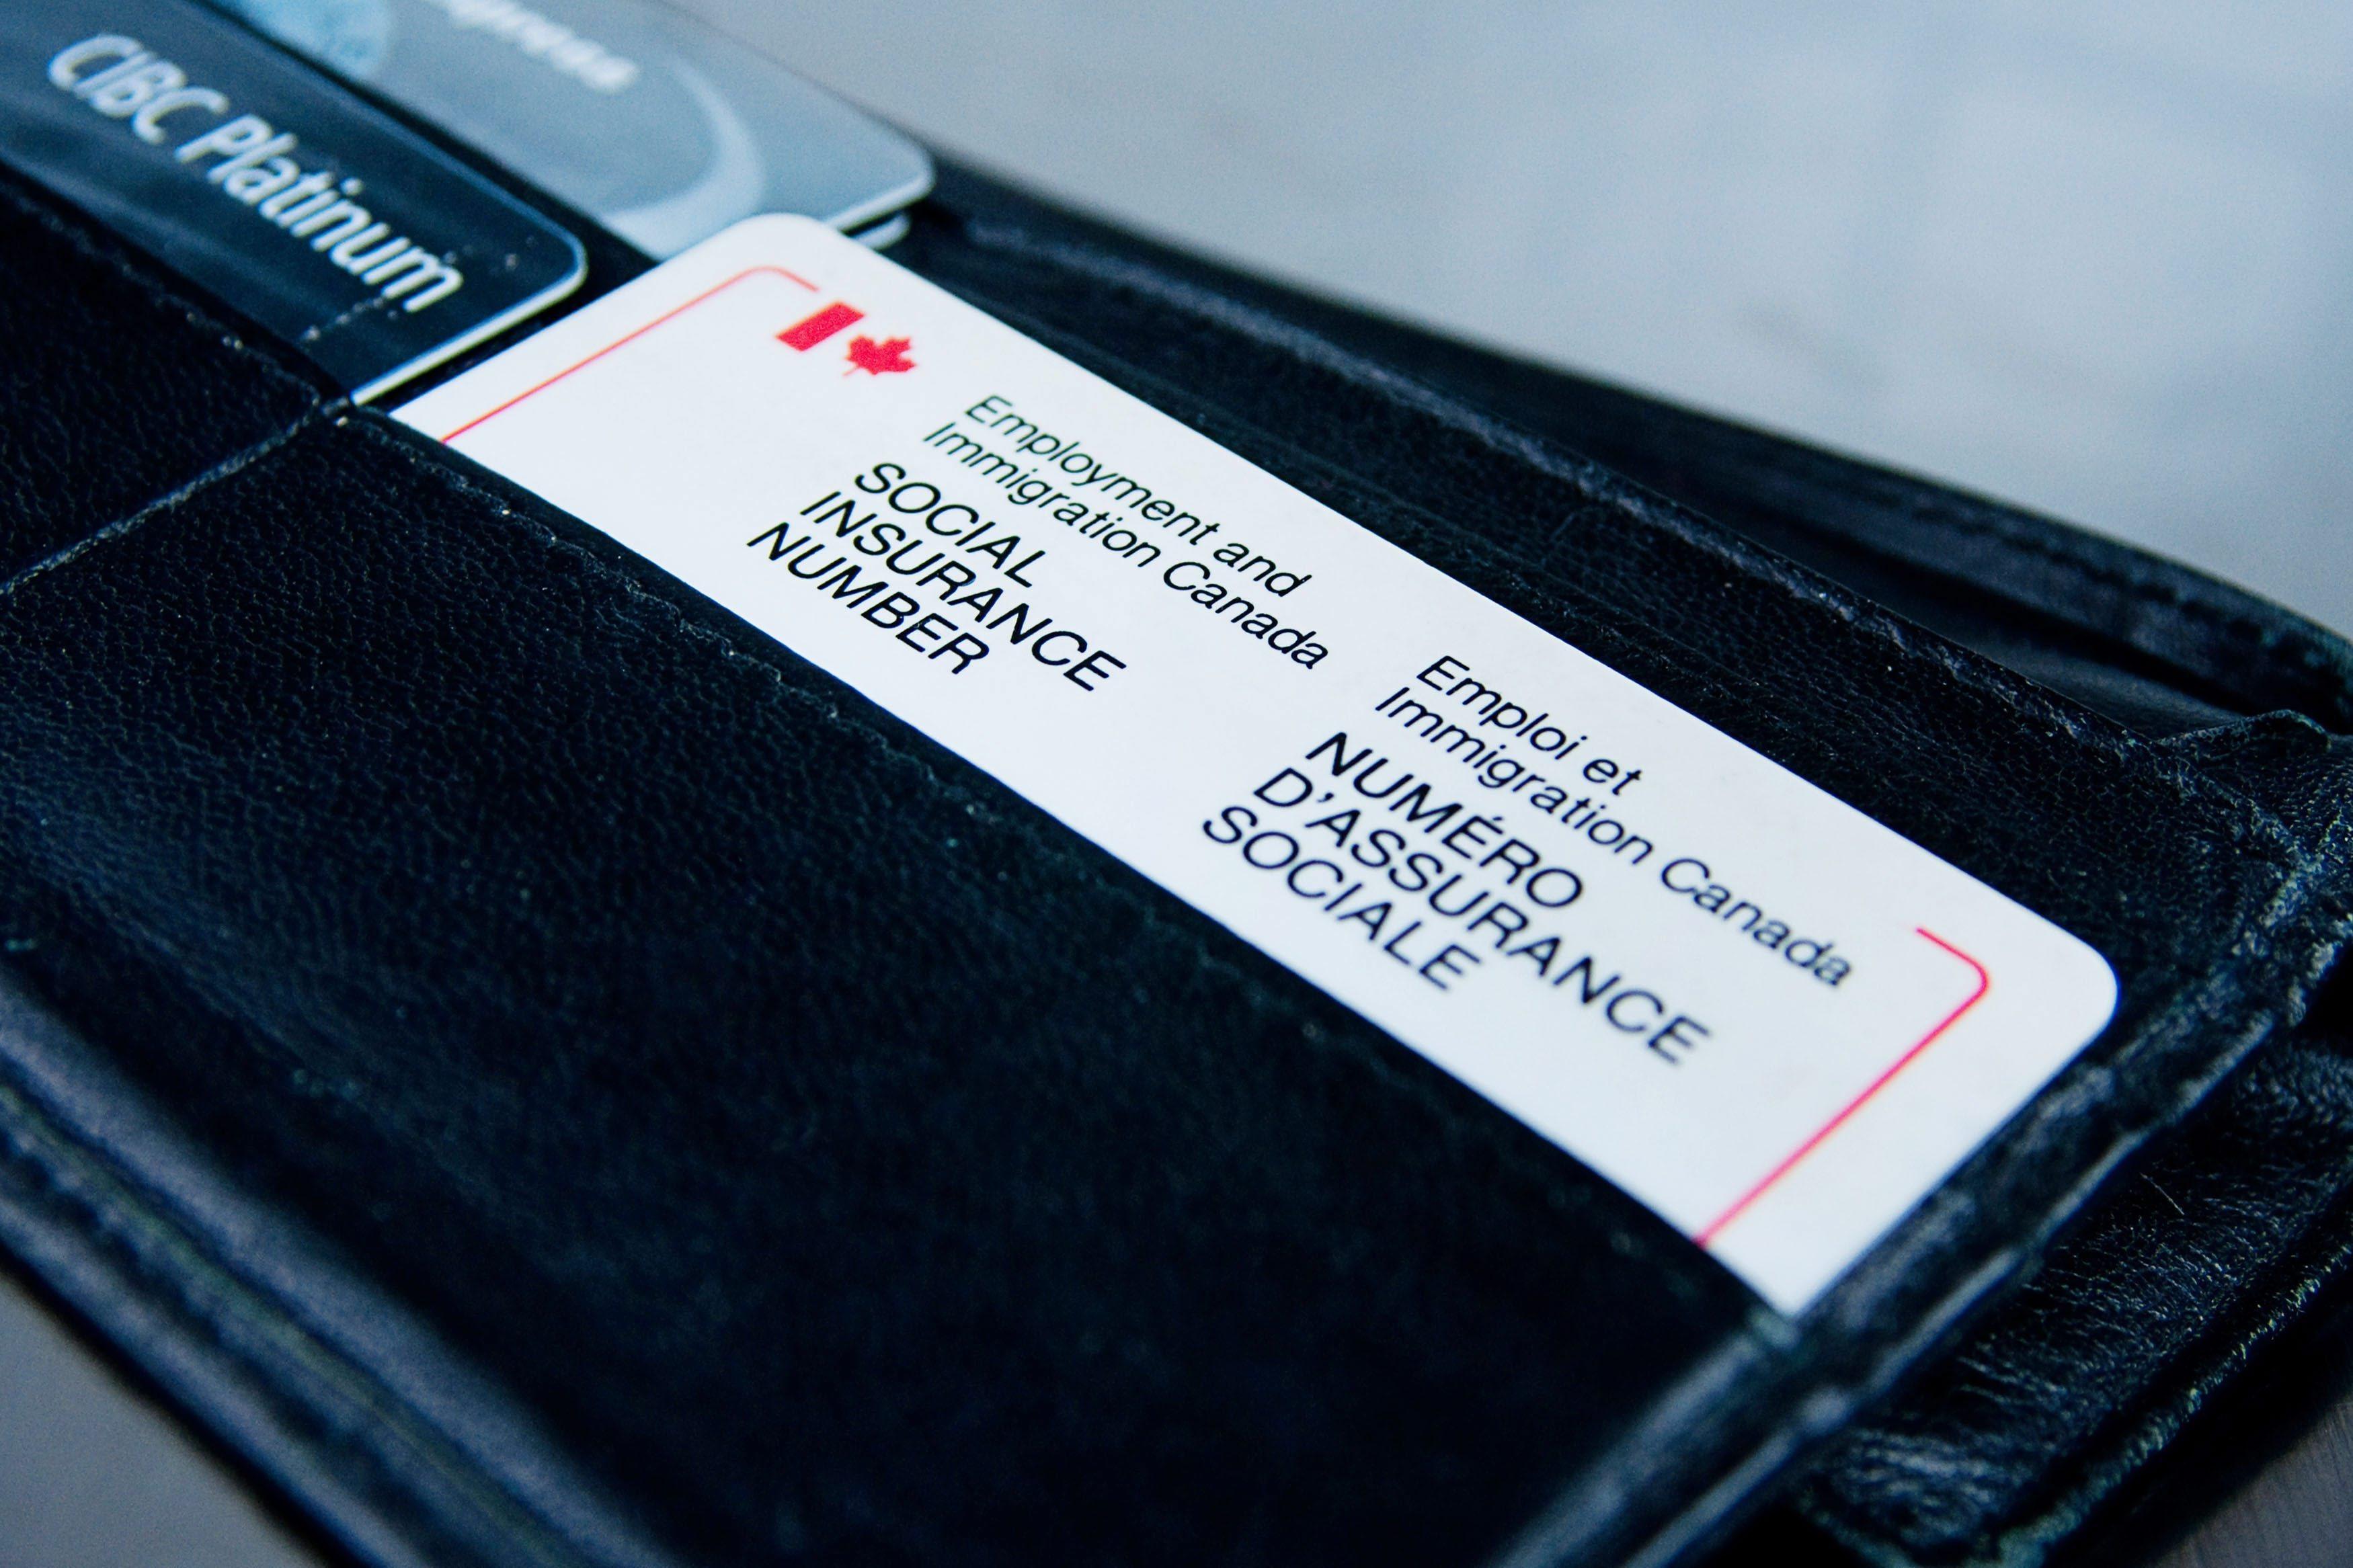 social insurance number card